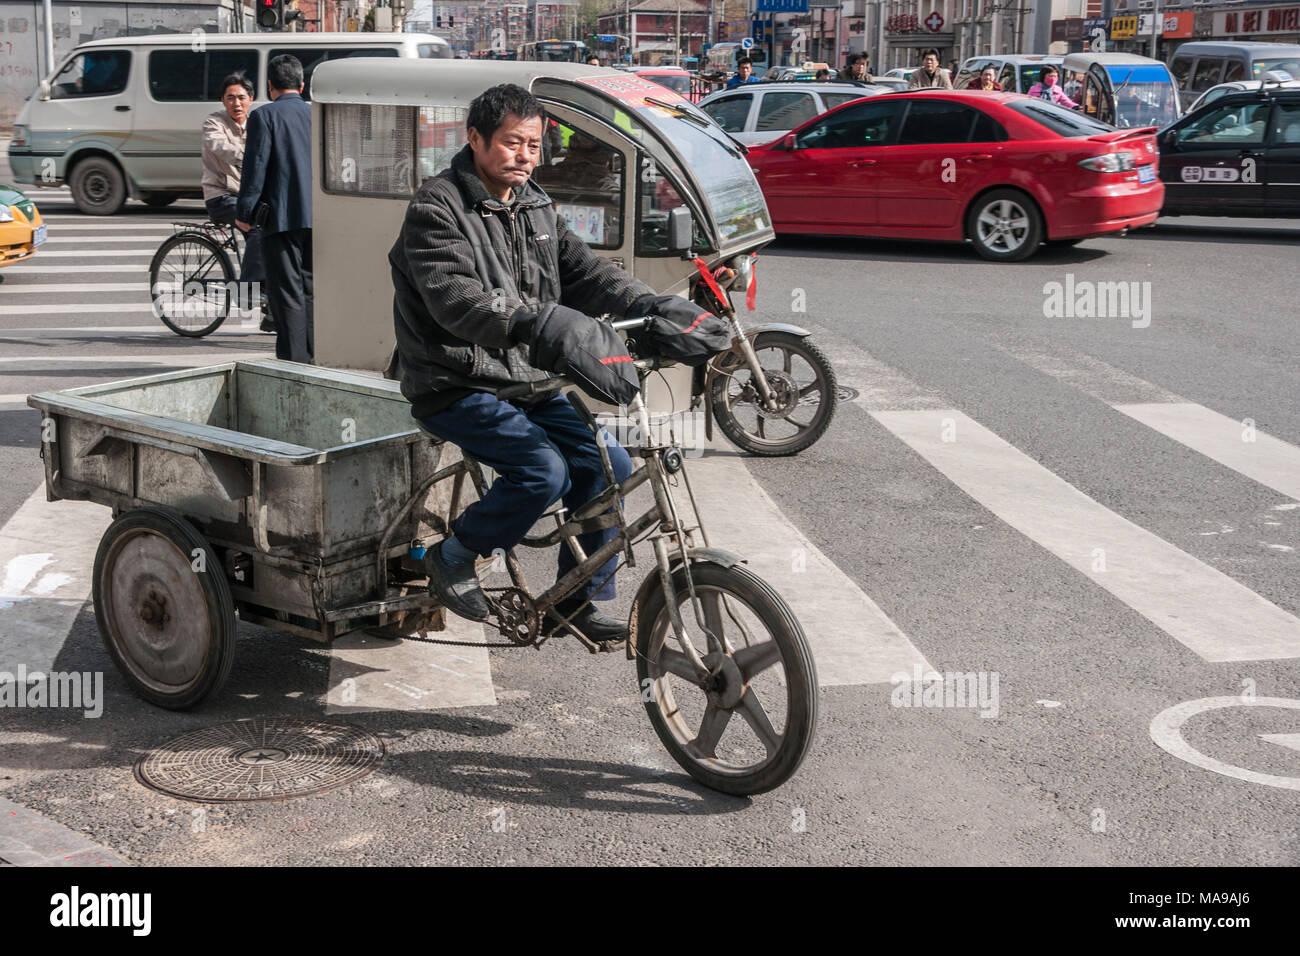 cars bikes stock photos & cars bikes stock images - alamy